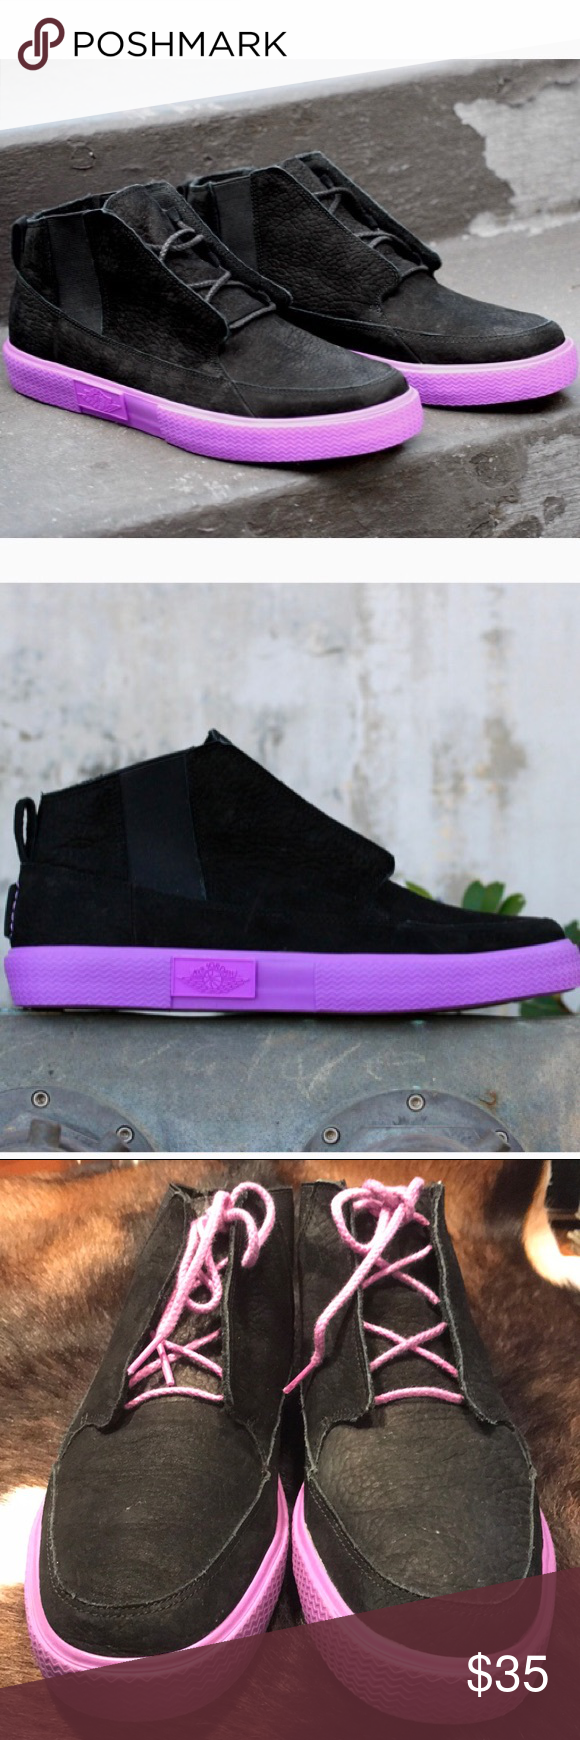 Nike Jordan V.2 Grown Black Bright Violet Spark Preowned GUC Mens Nike Air 0a6d29355